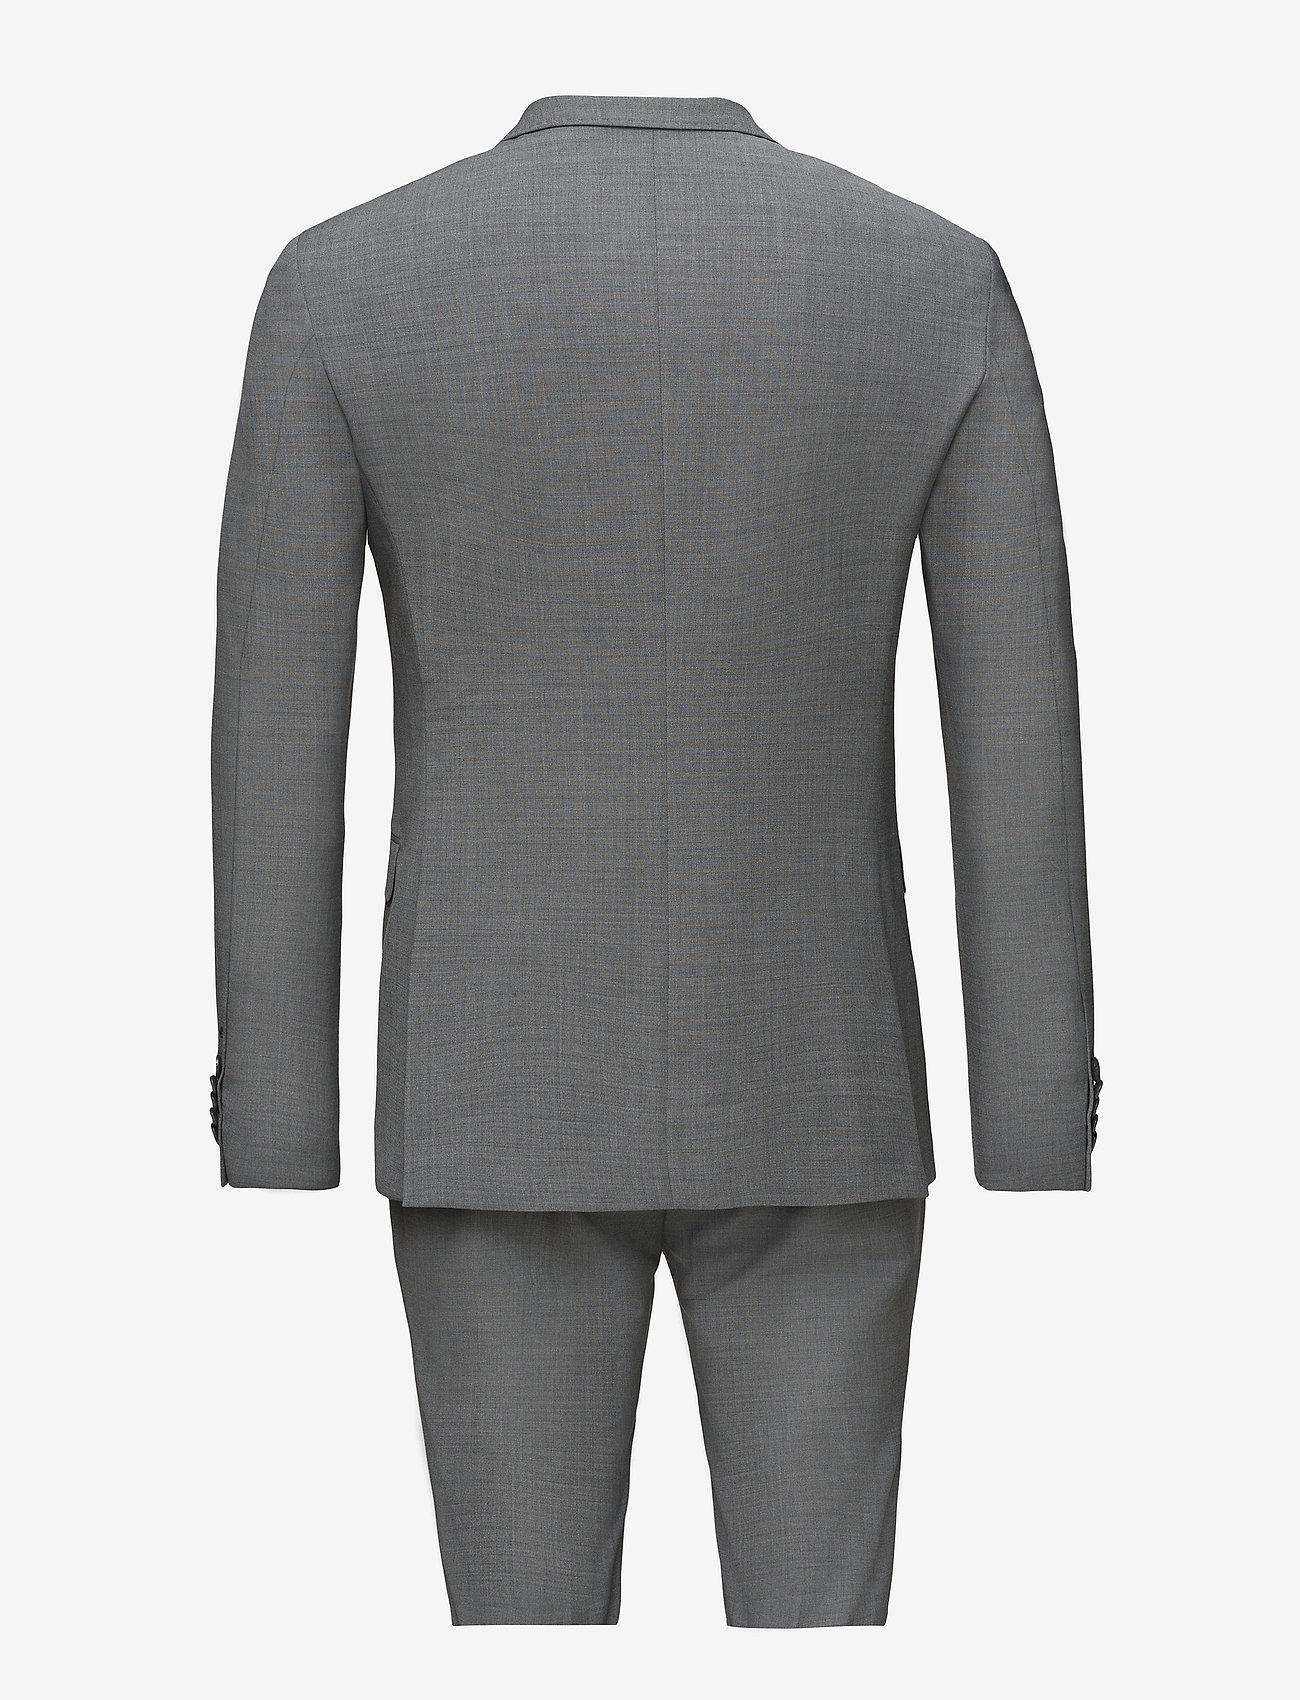 Bertoni - Davidsen-Ravn - enkelknäppta kostymer - 950 stone - 1